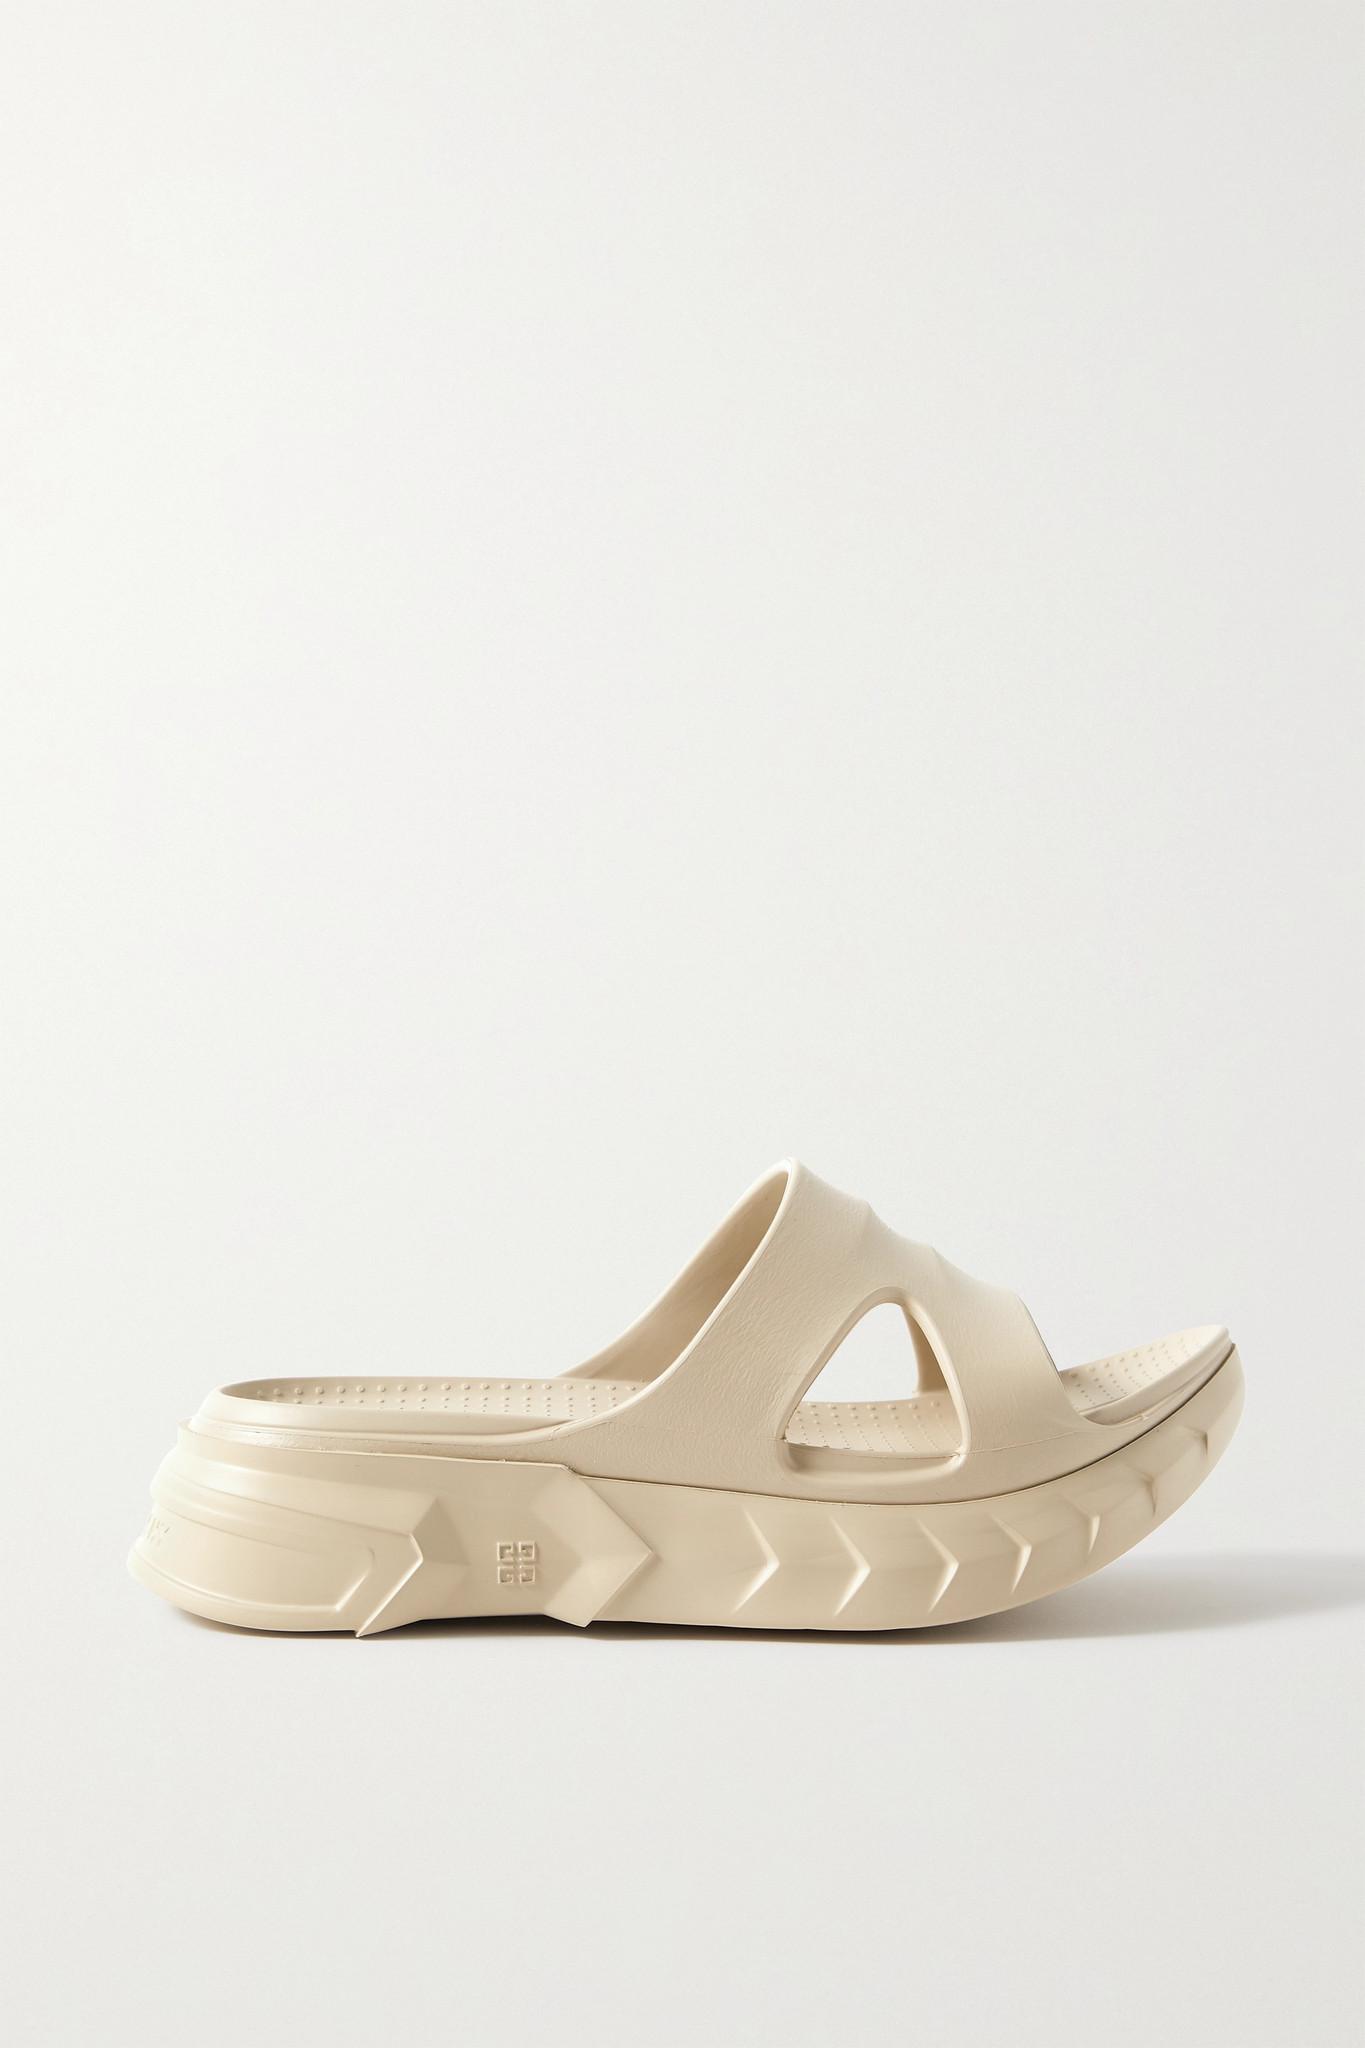 GIVENCHY - Marshmallow 橡胶拖鞋 - 中性色 - IT41